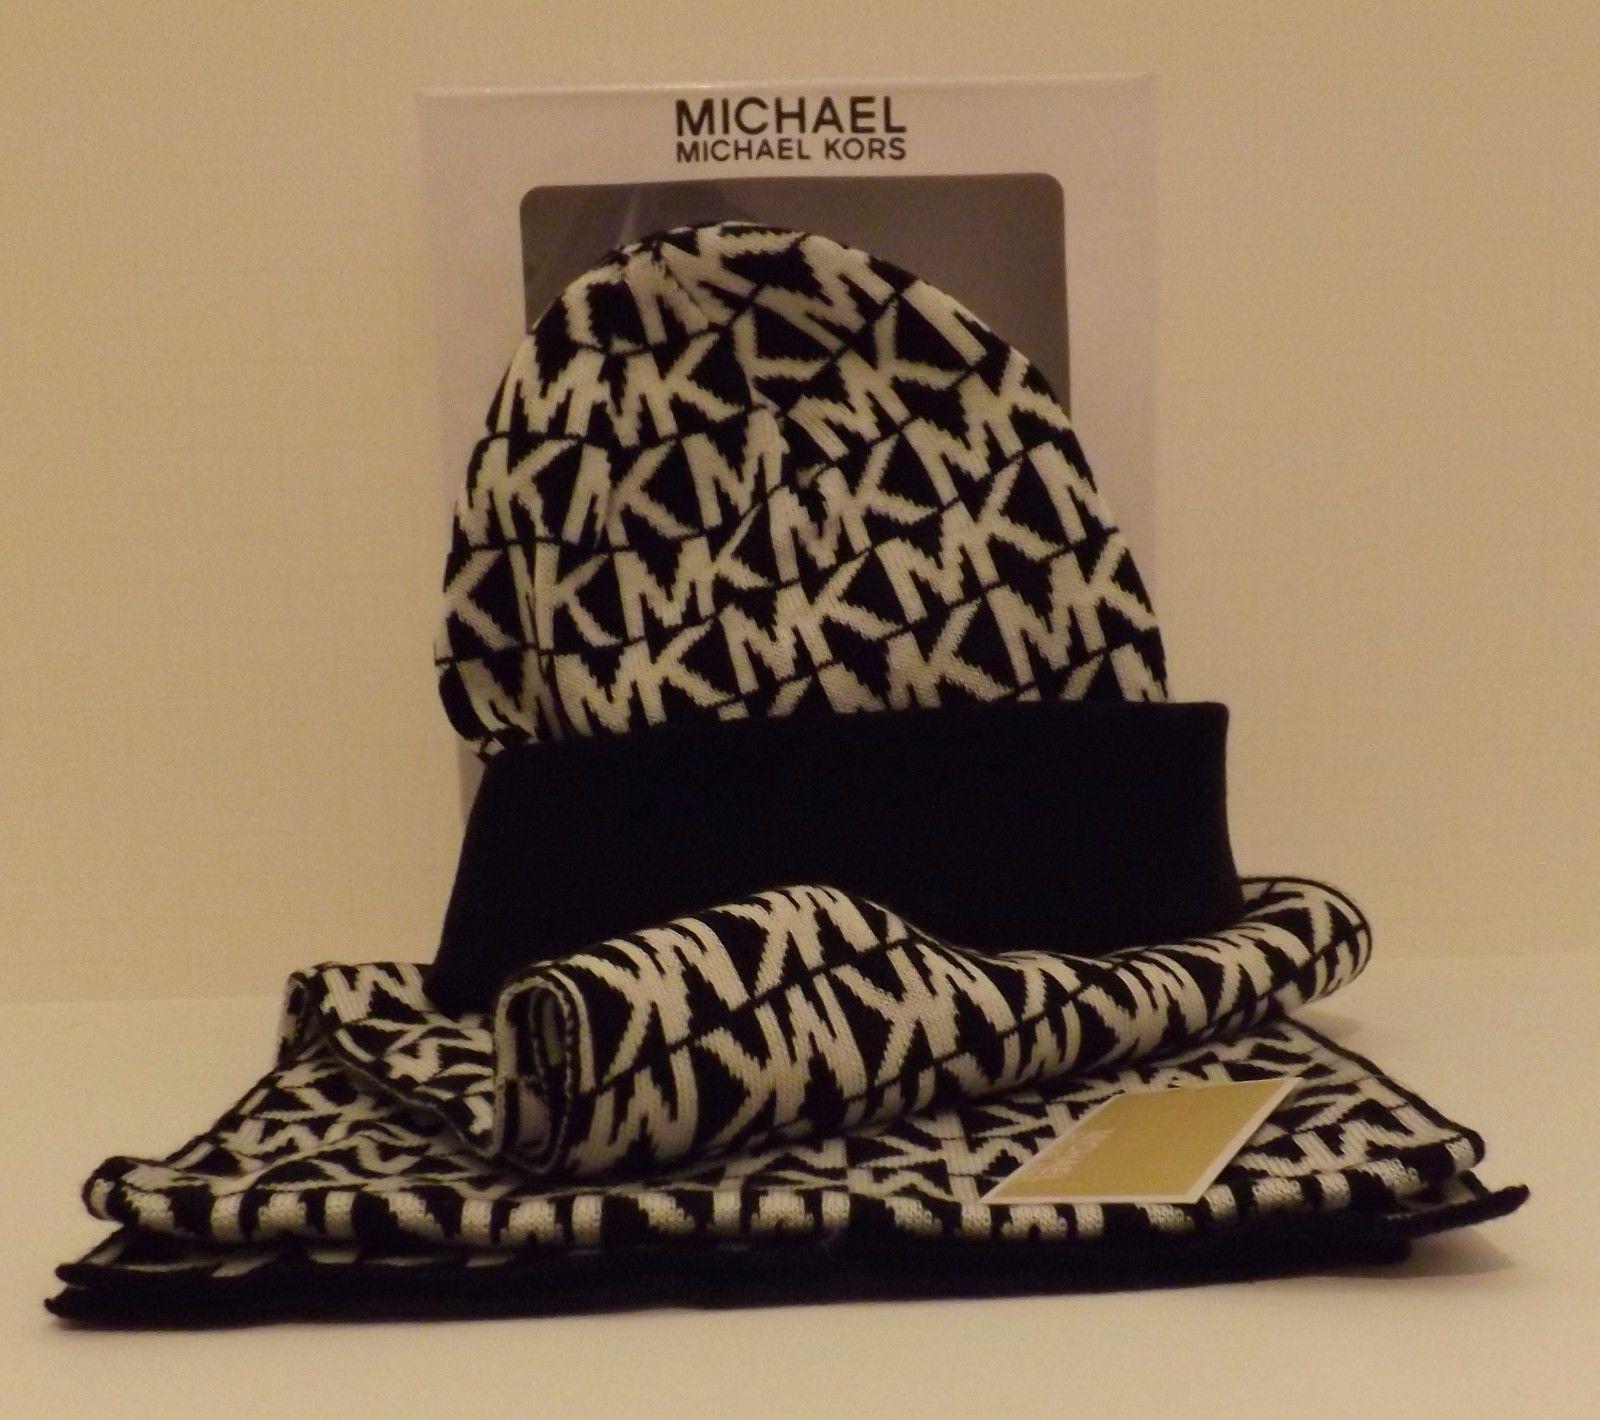 genuine michael kors black white s scarf and hat